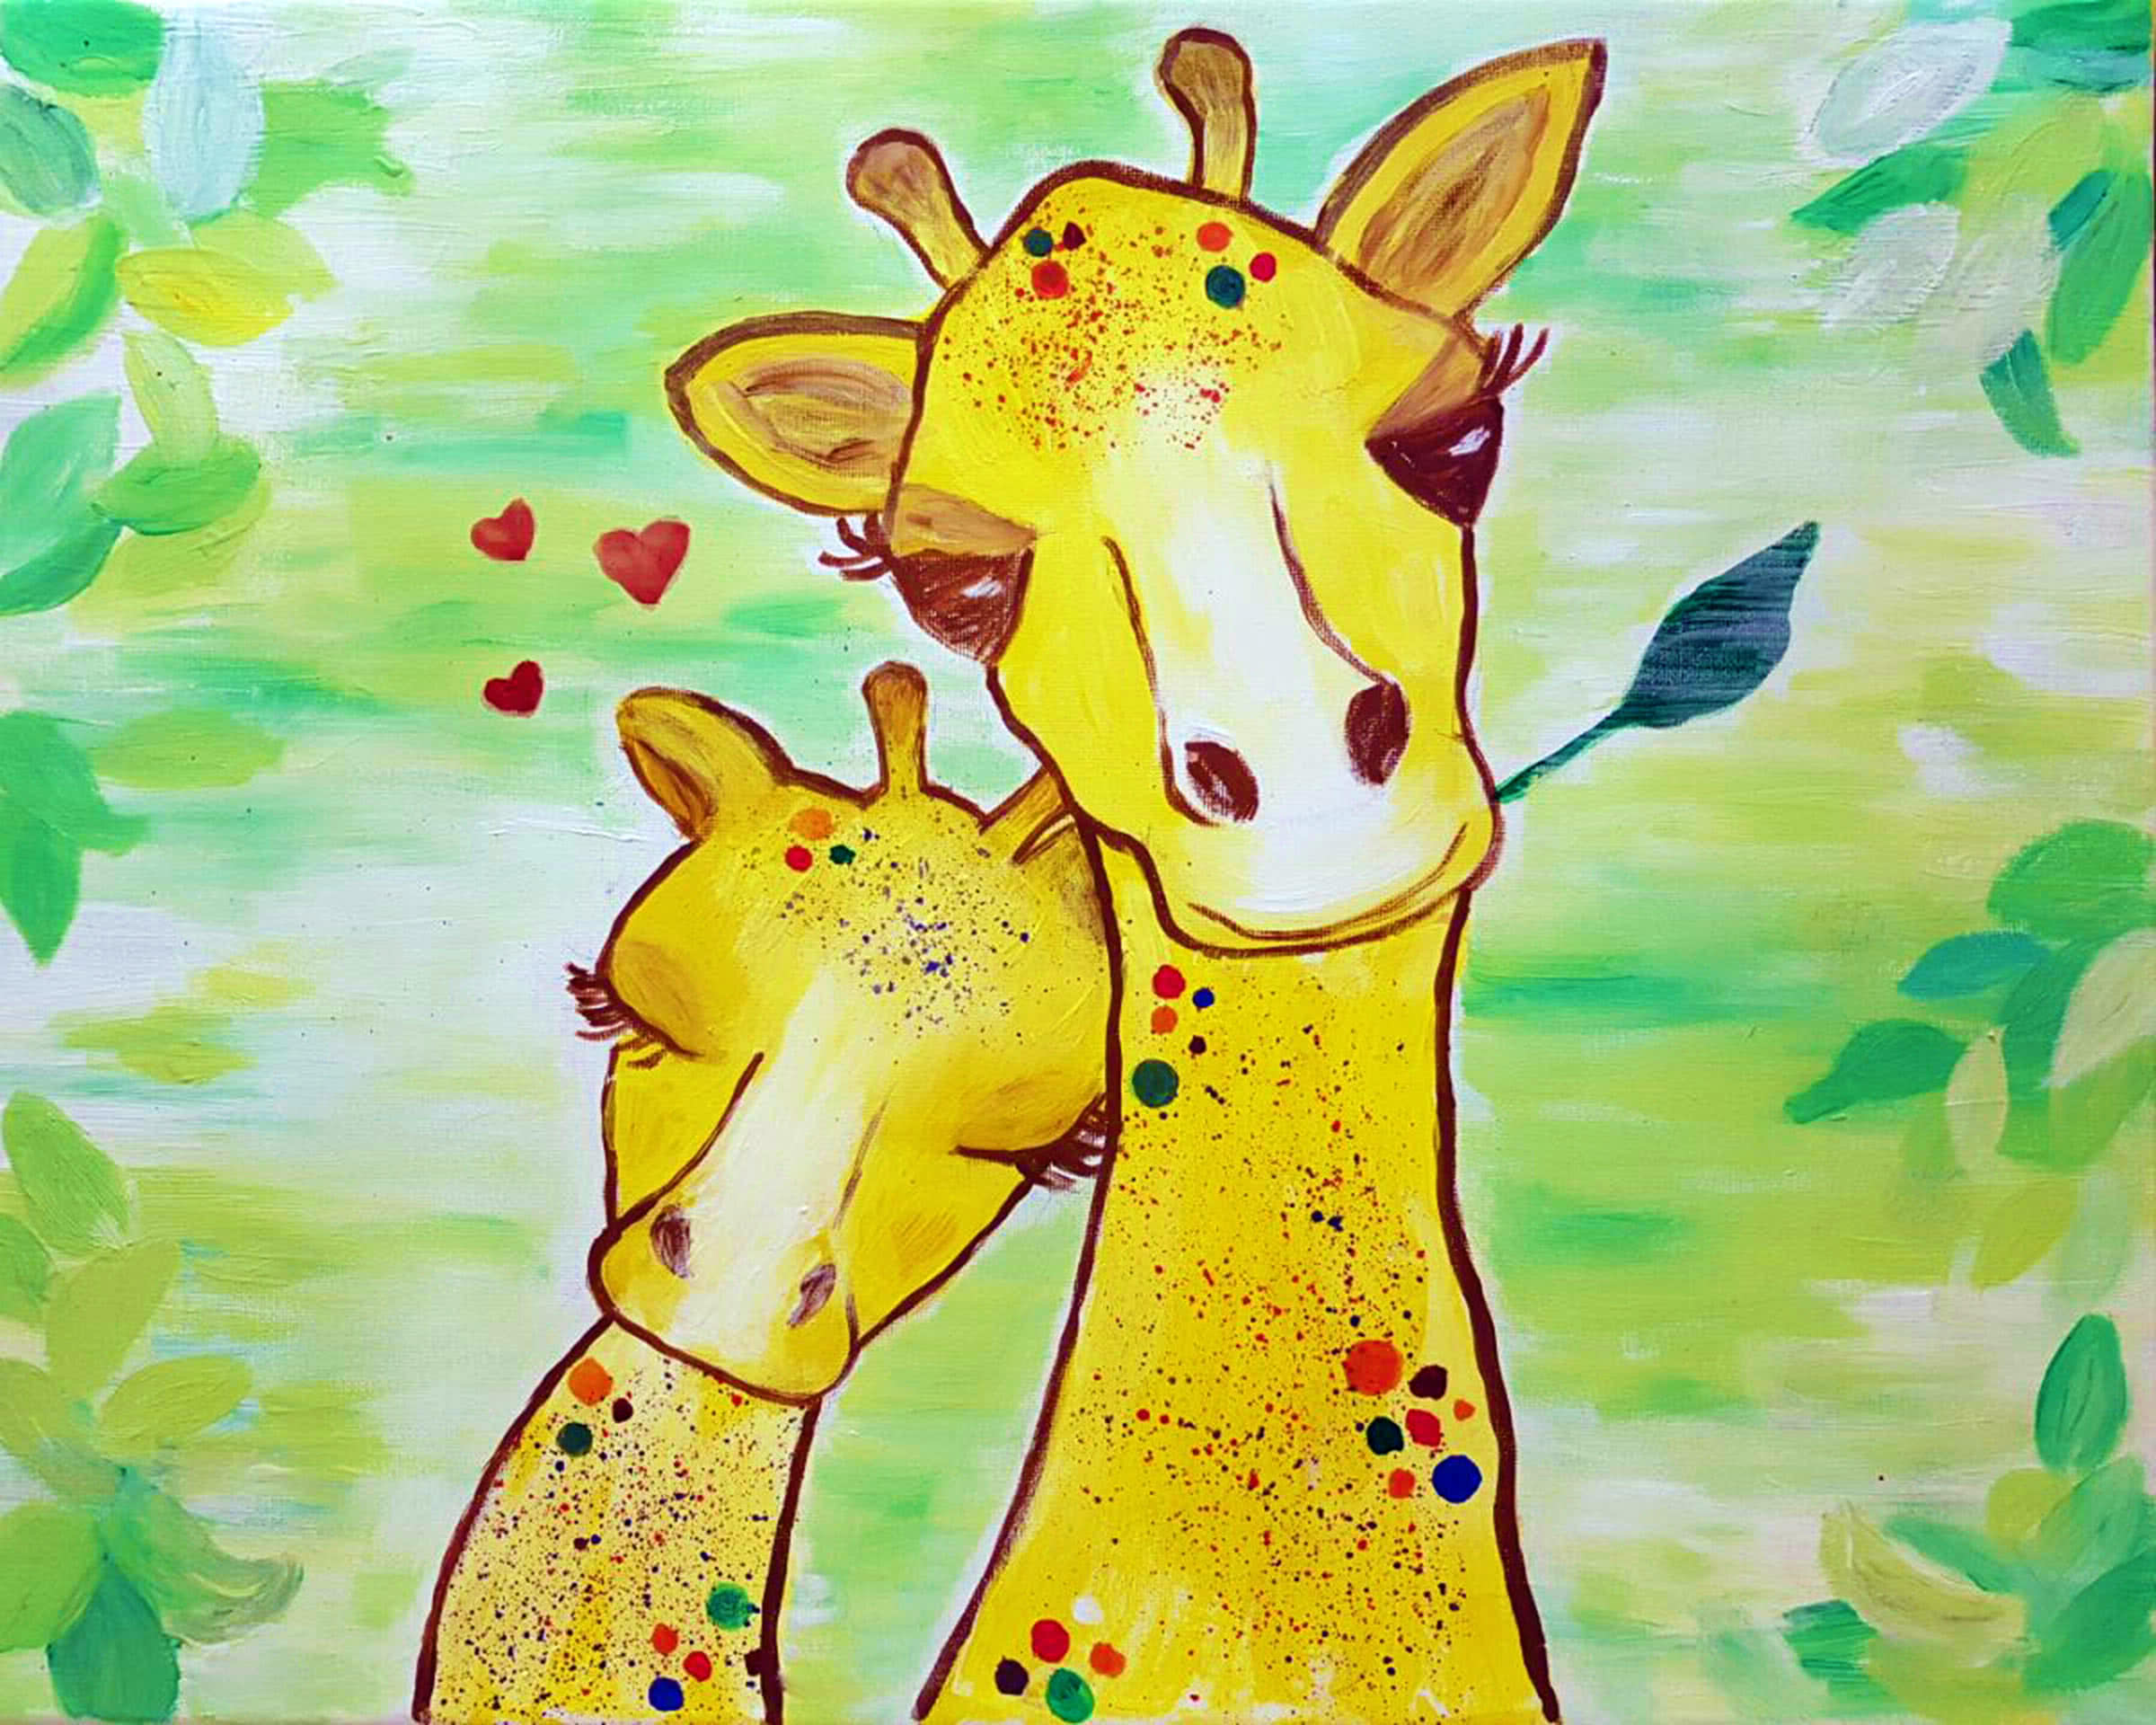 A Little Giraffe Lula experience project by Yaymaker